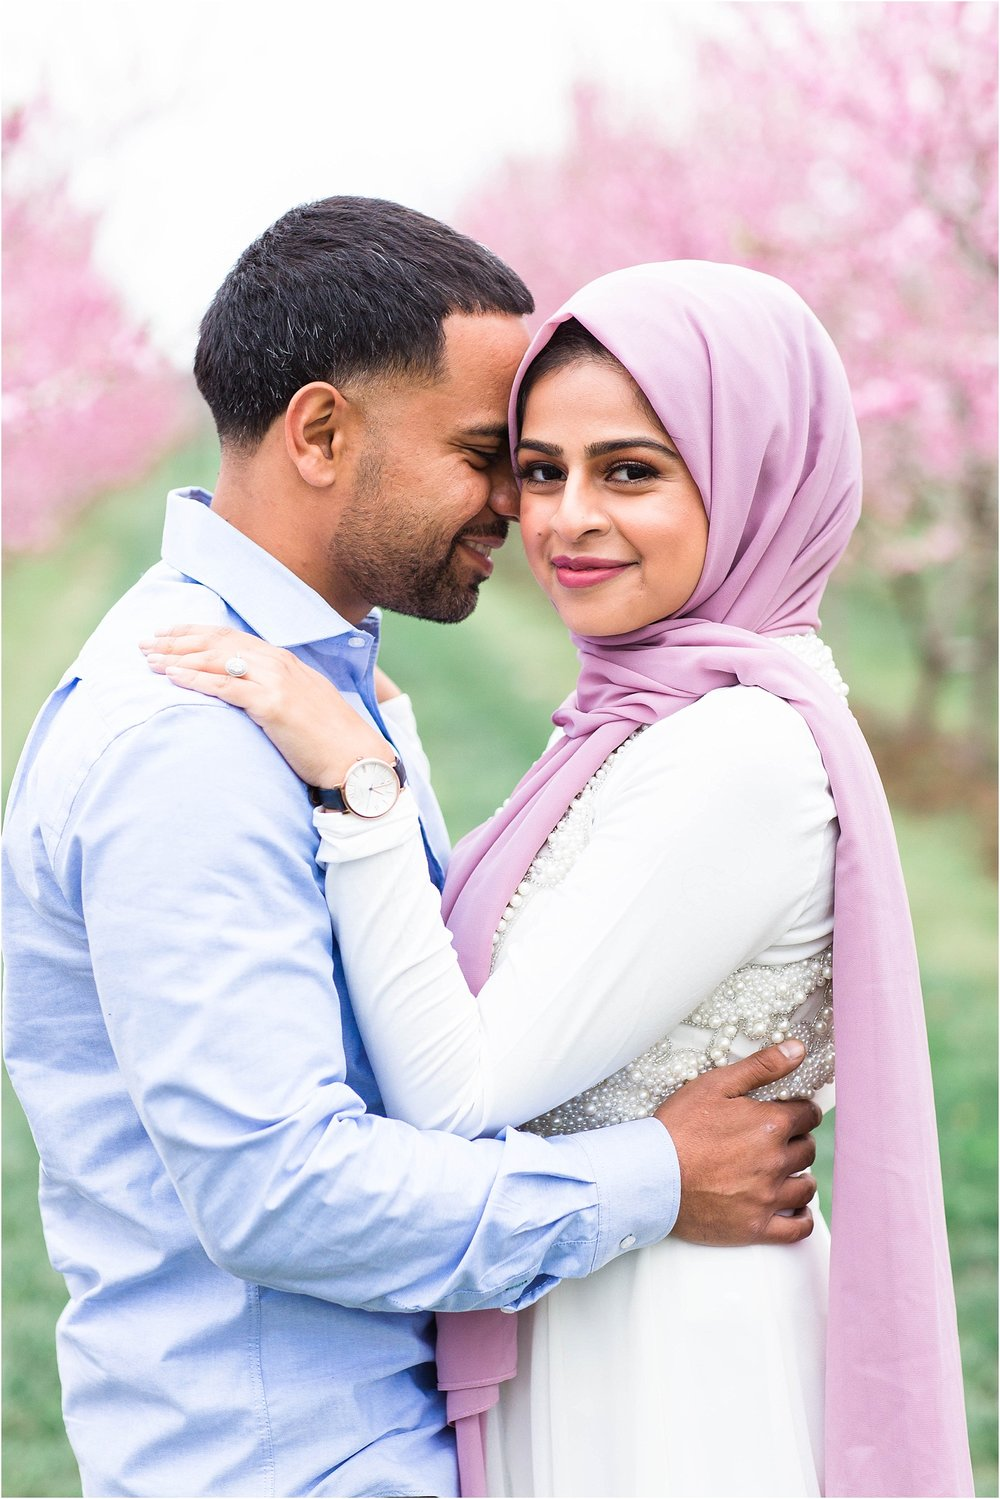 Niagara-on-the-lake-cherry-blossom-farm-Engagement-Session-Toronto-Mississauga-Brampton-Scarborough-GTA-Pakistani-Indian-Wedding-Engagement-Photographer-Photography_0006.jpg